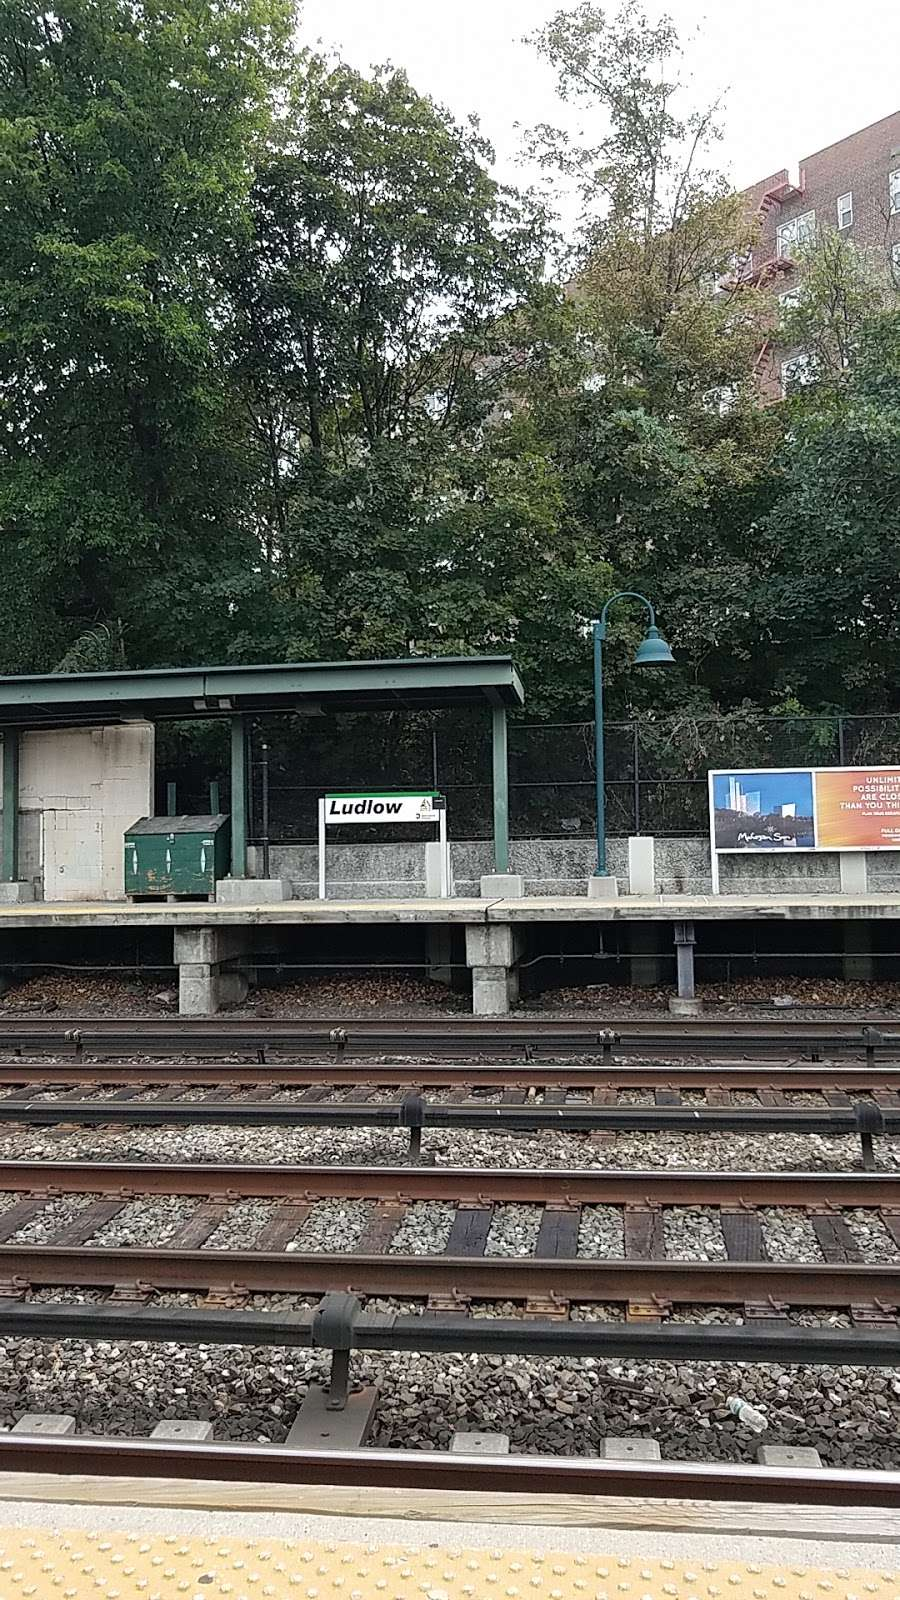 Ludlow - train station    Photo 9 of 10   Address: Yonkers, NY 10705, USA